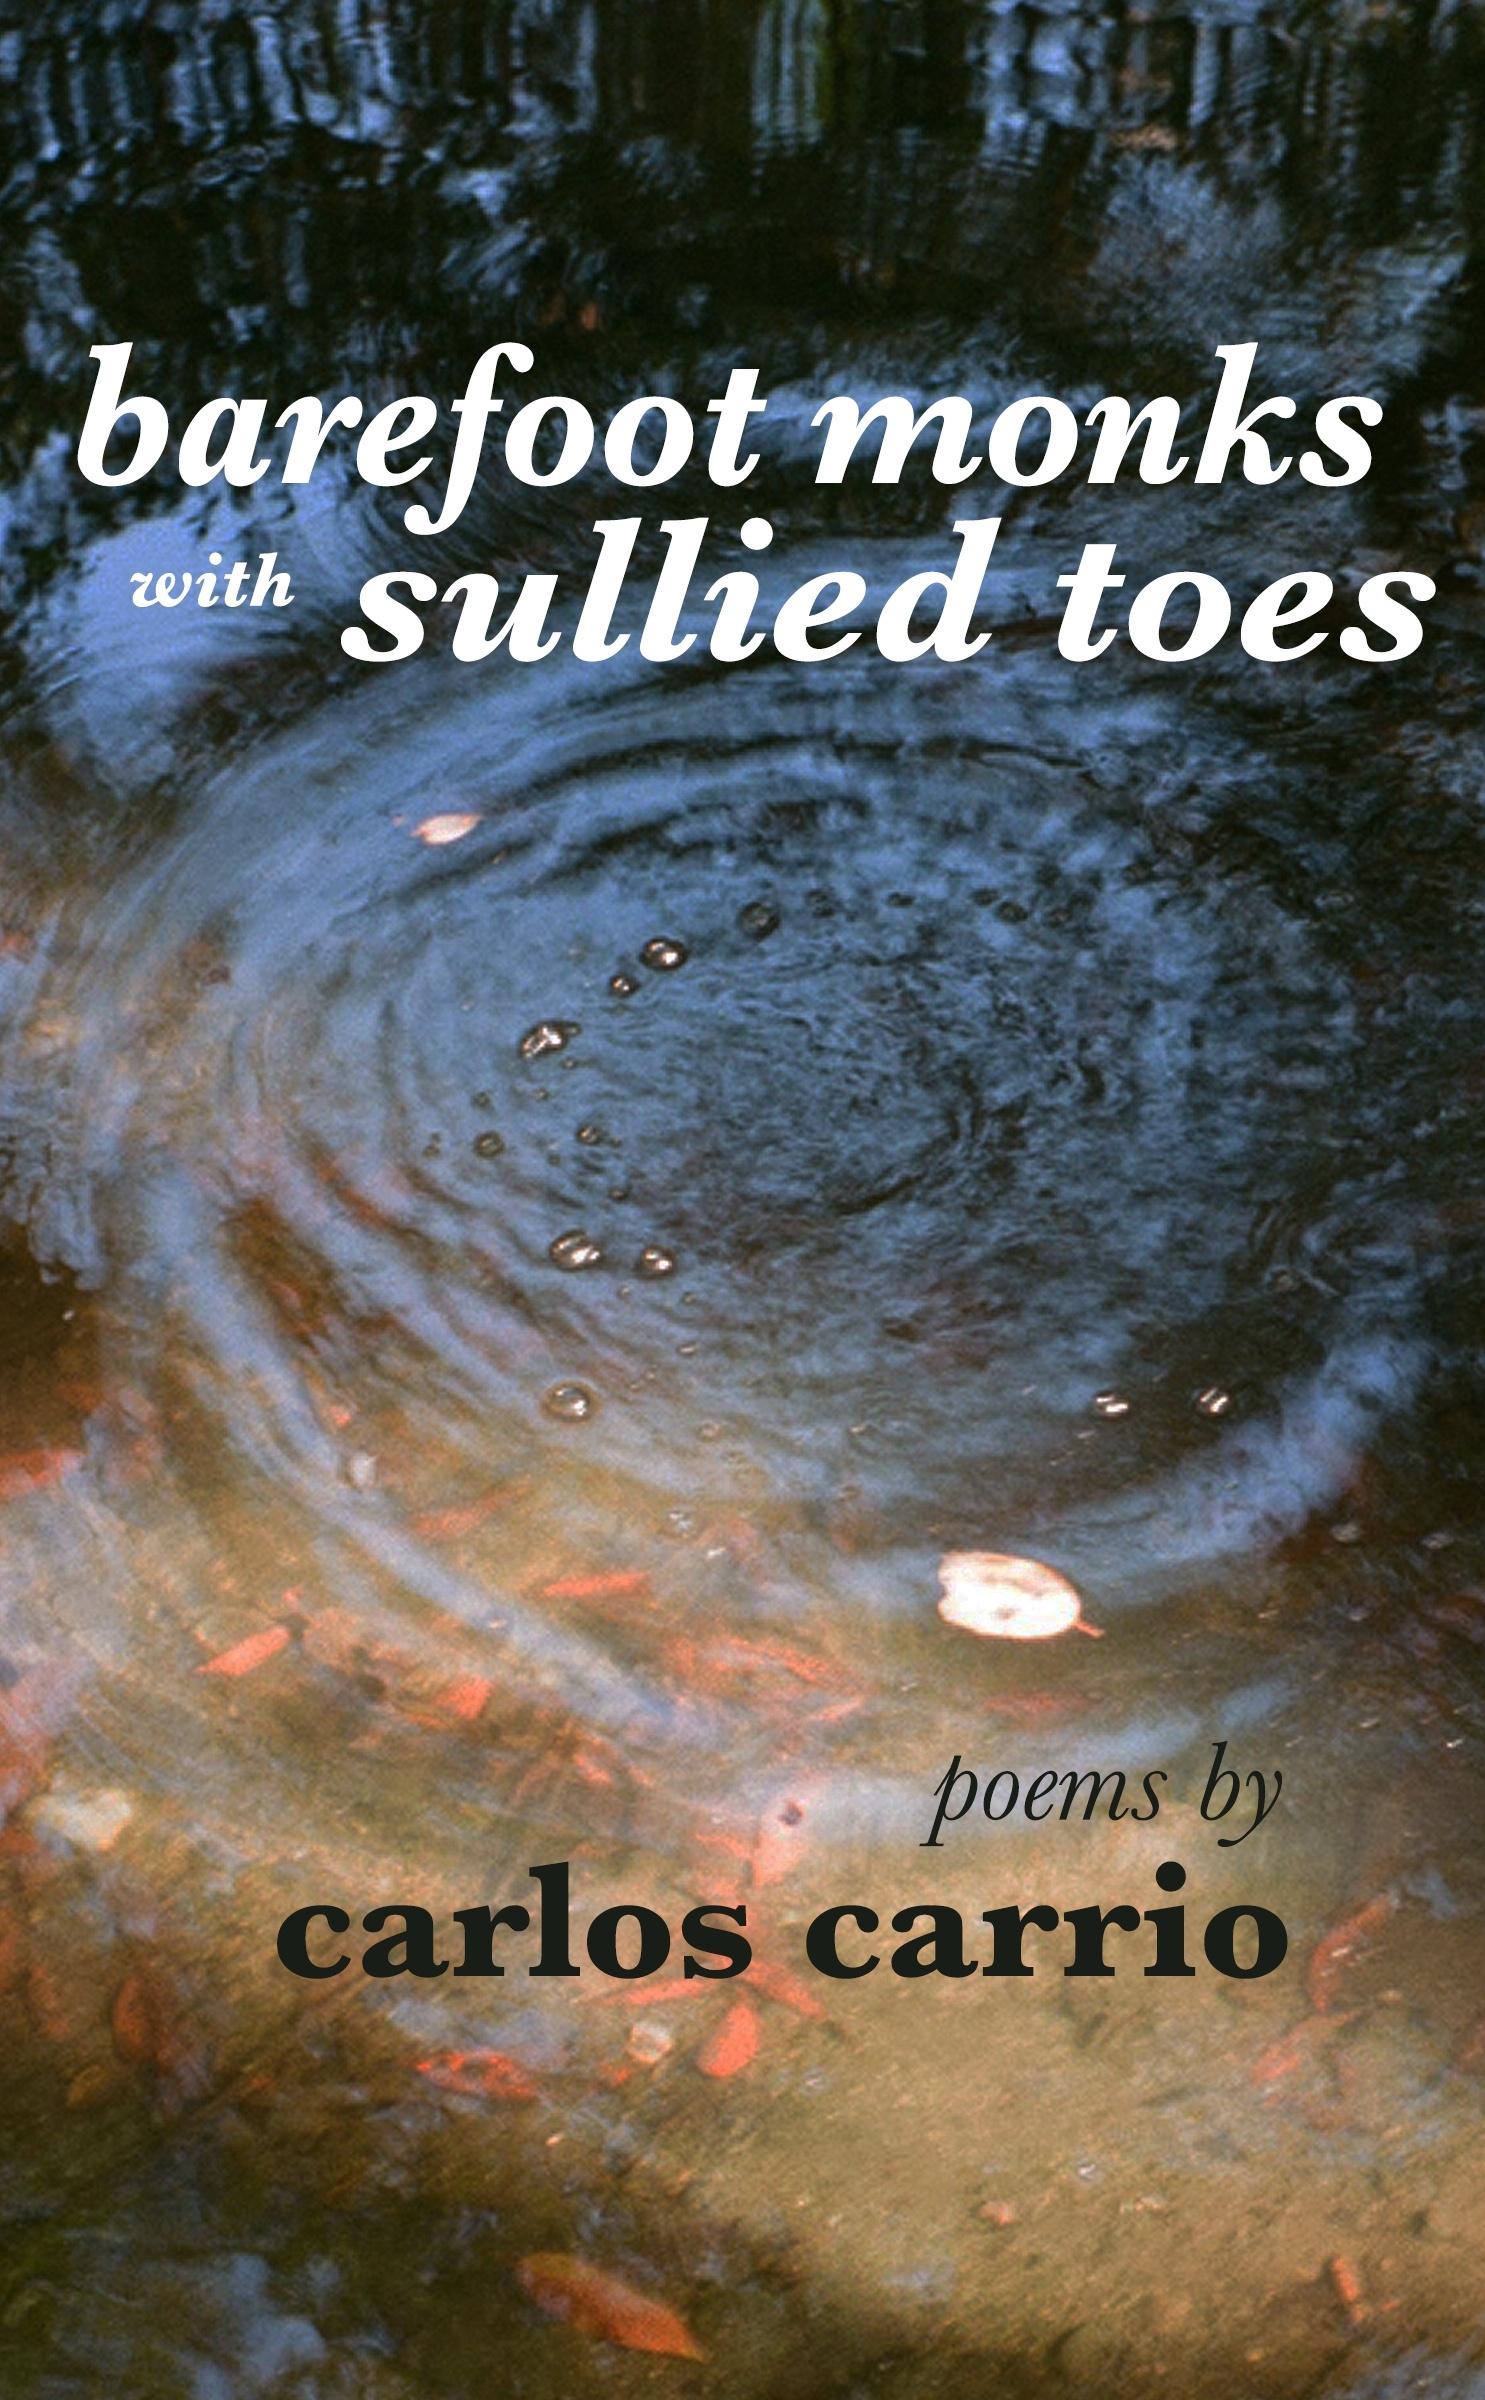 https://0201.nccdn.net/1_2/000/000/0c2/654/barefootmonks-Carlos-Carrio-Front-coverfinal-1485x2400.jpg